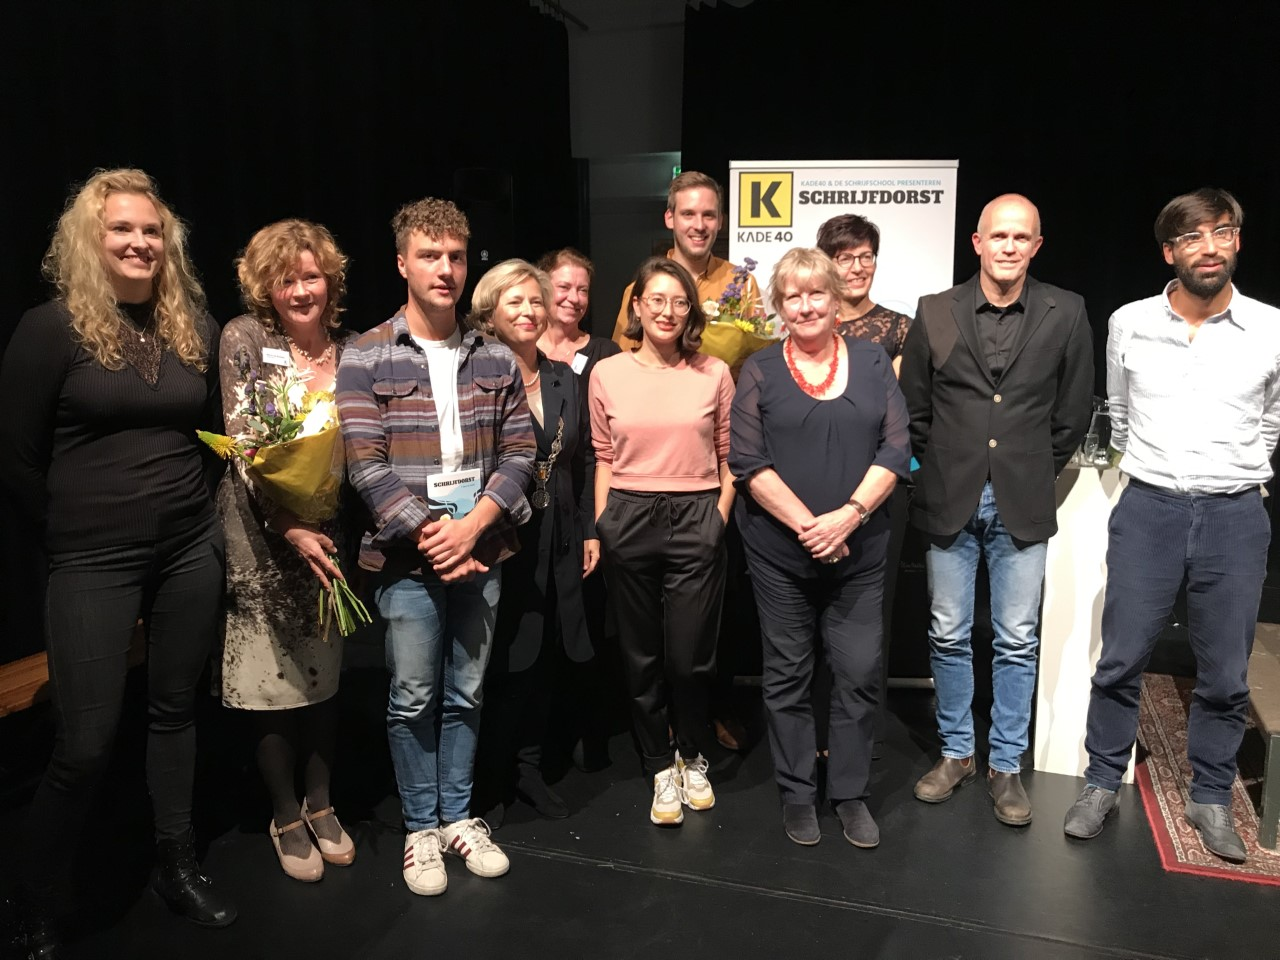 Vlaming en Gelderse winnen Vlaardingse schrijfwedstrijd